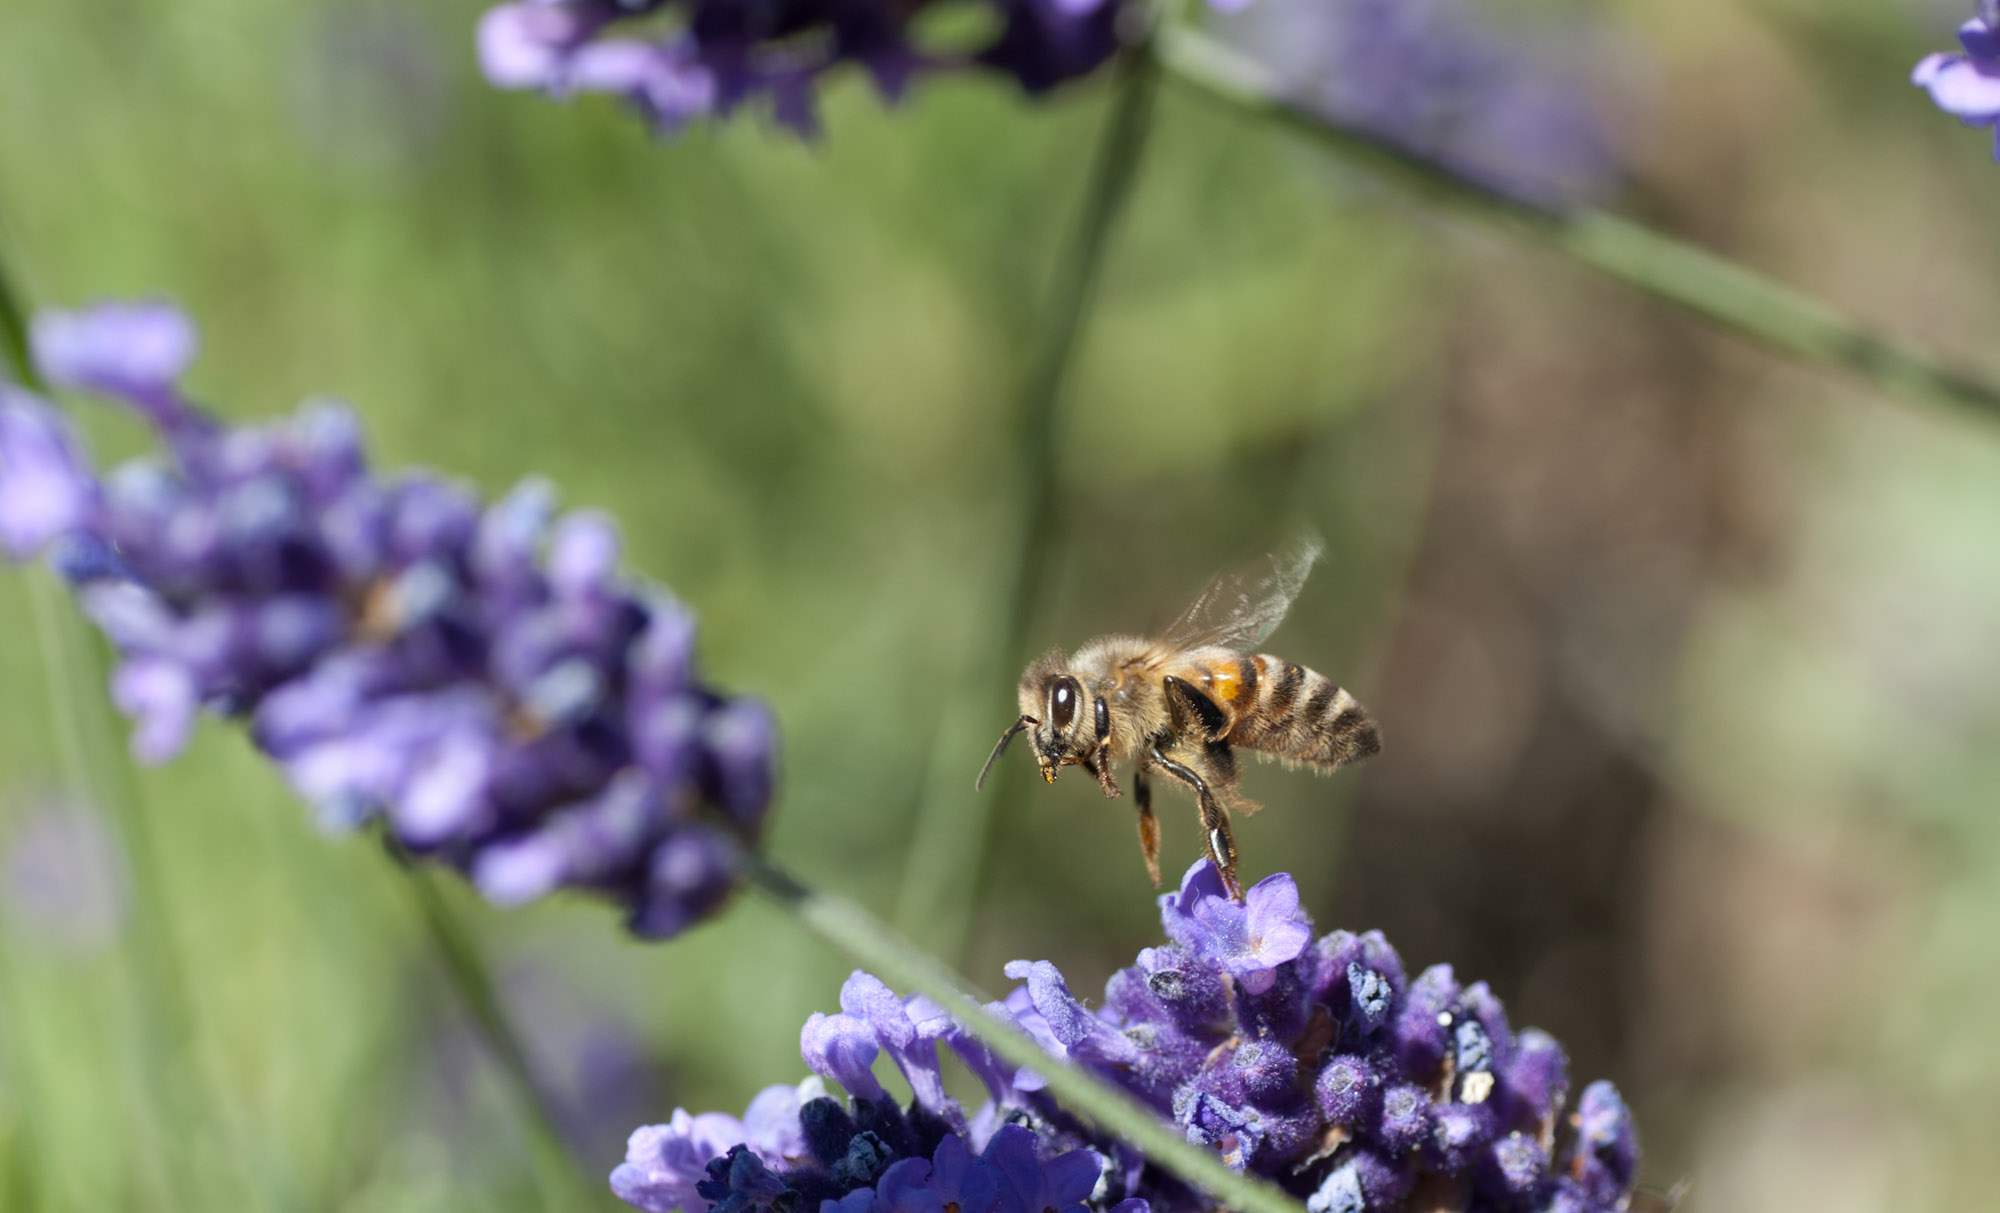 Honey bee and lavendar. Photo: Don Enright